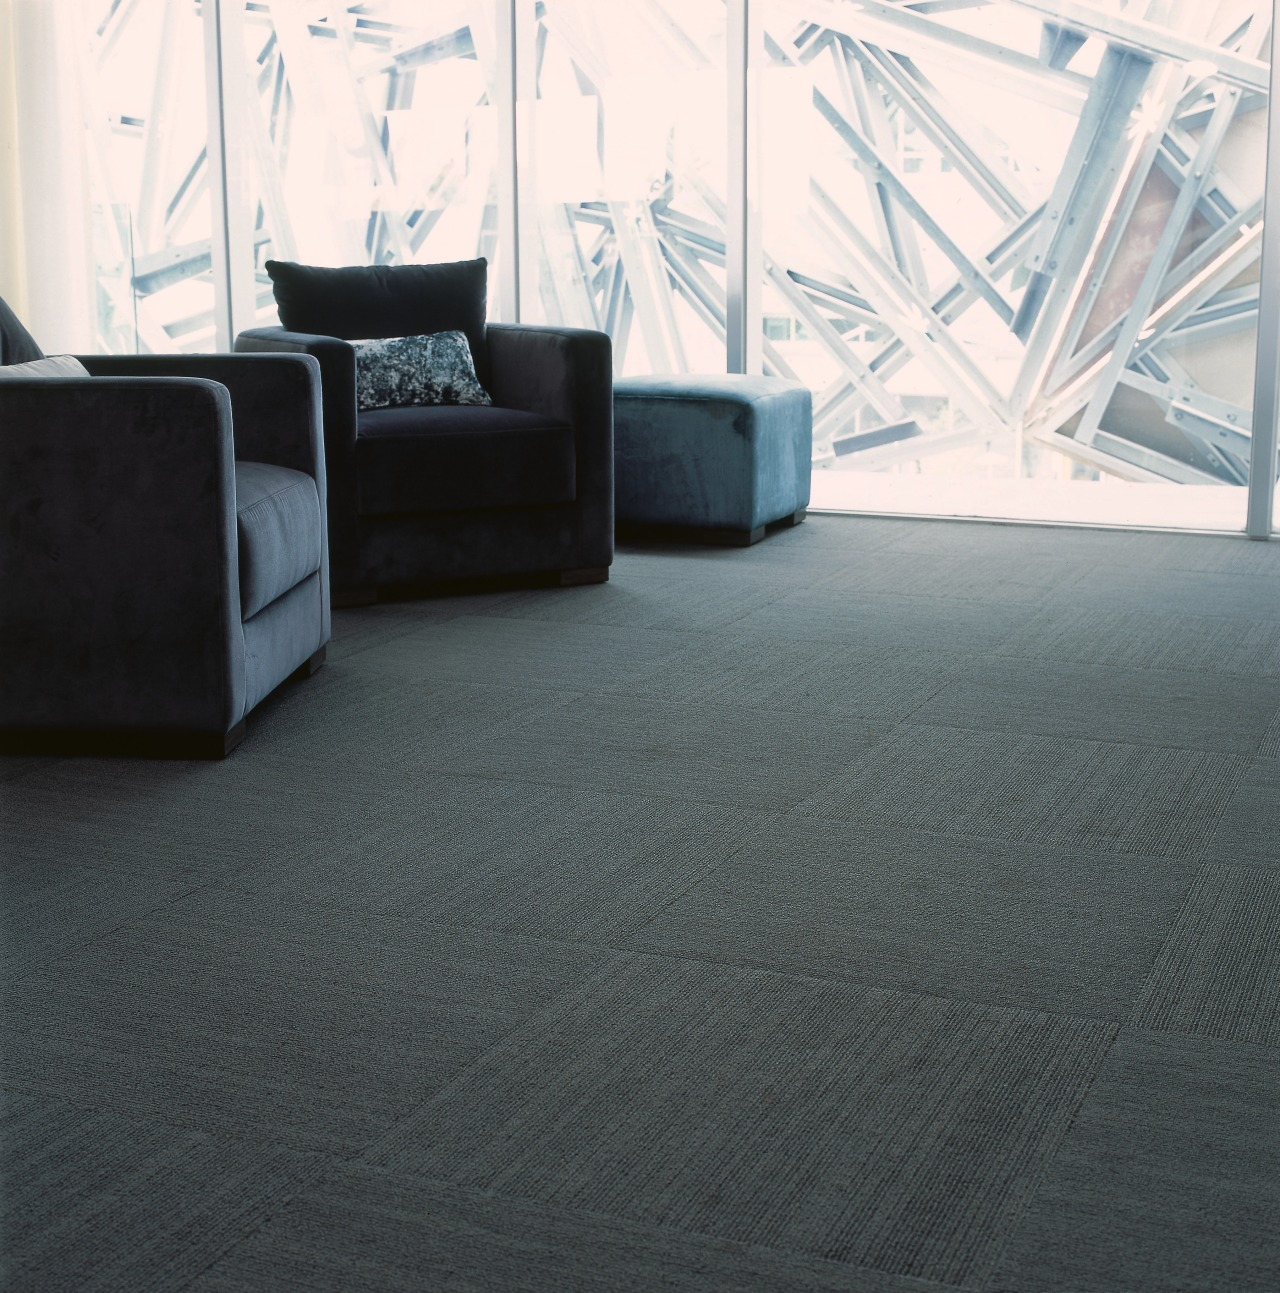 Grey carpet with grey armchairs and steel beams angle, carpet, chair, floor, flooring, furniture, hardwood, interior design, laminate flooring, living room, product design, table, tile, wood, wood flooring, black, gray